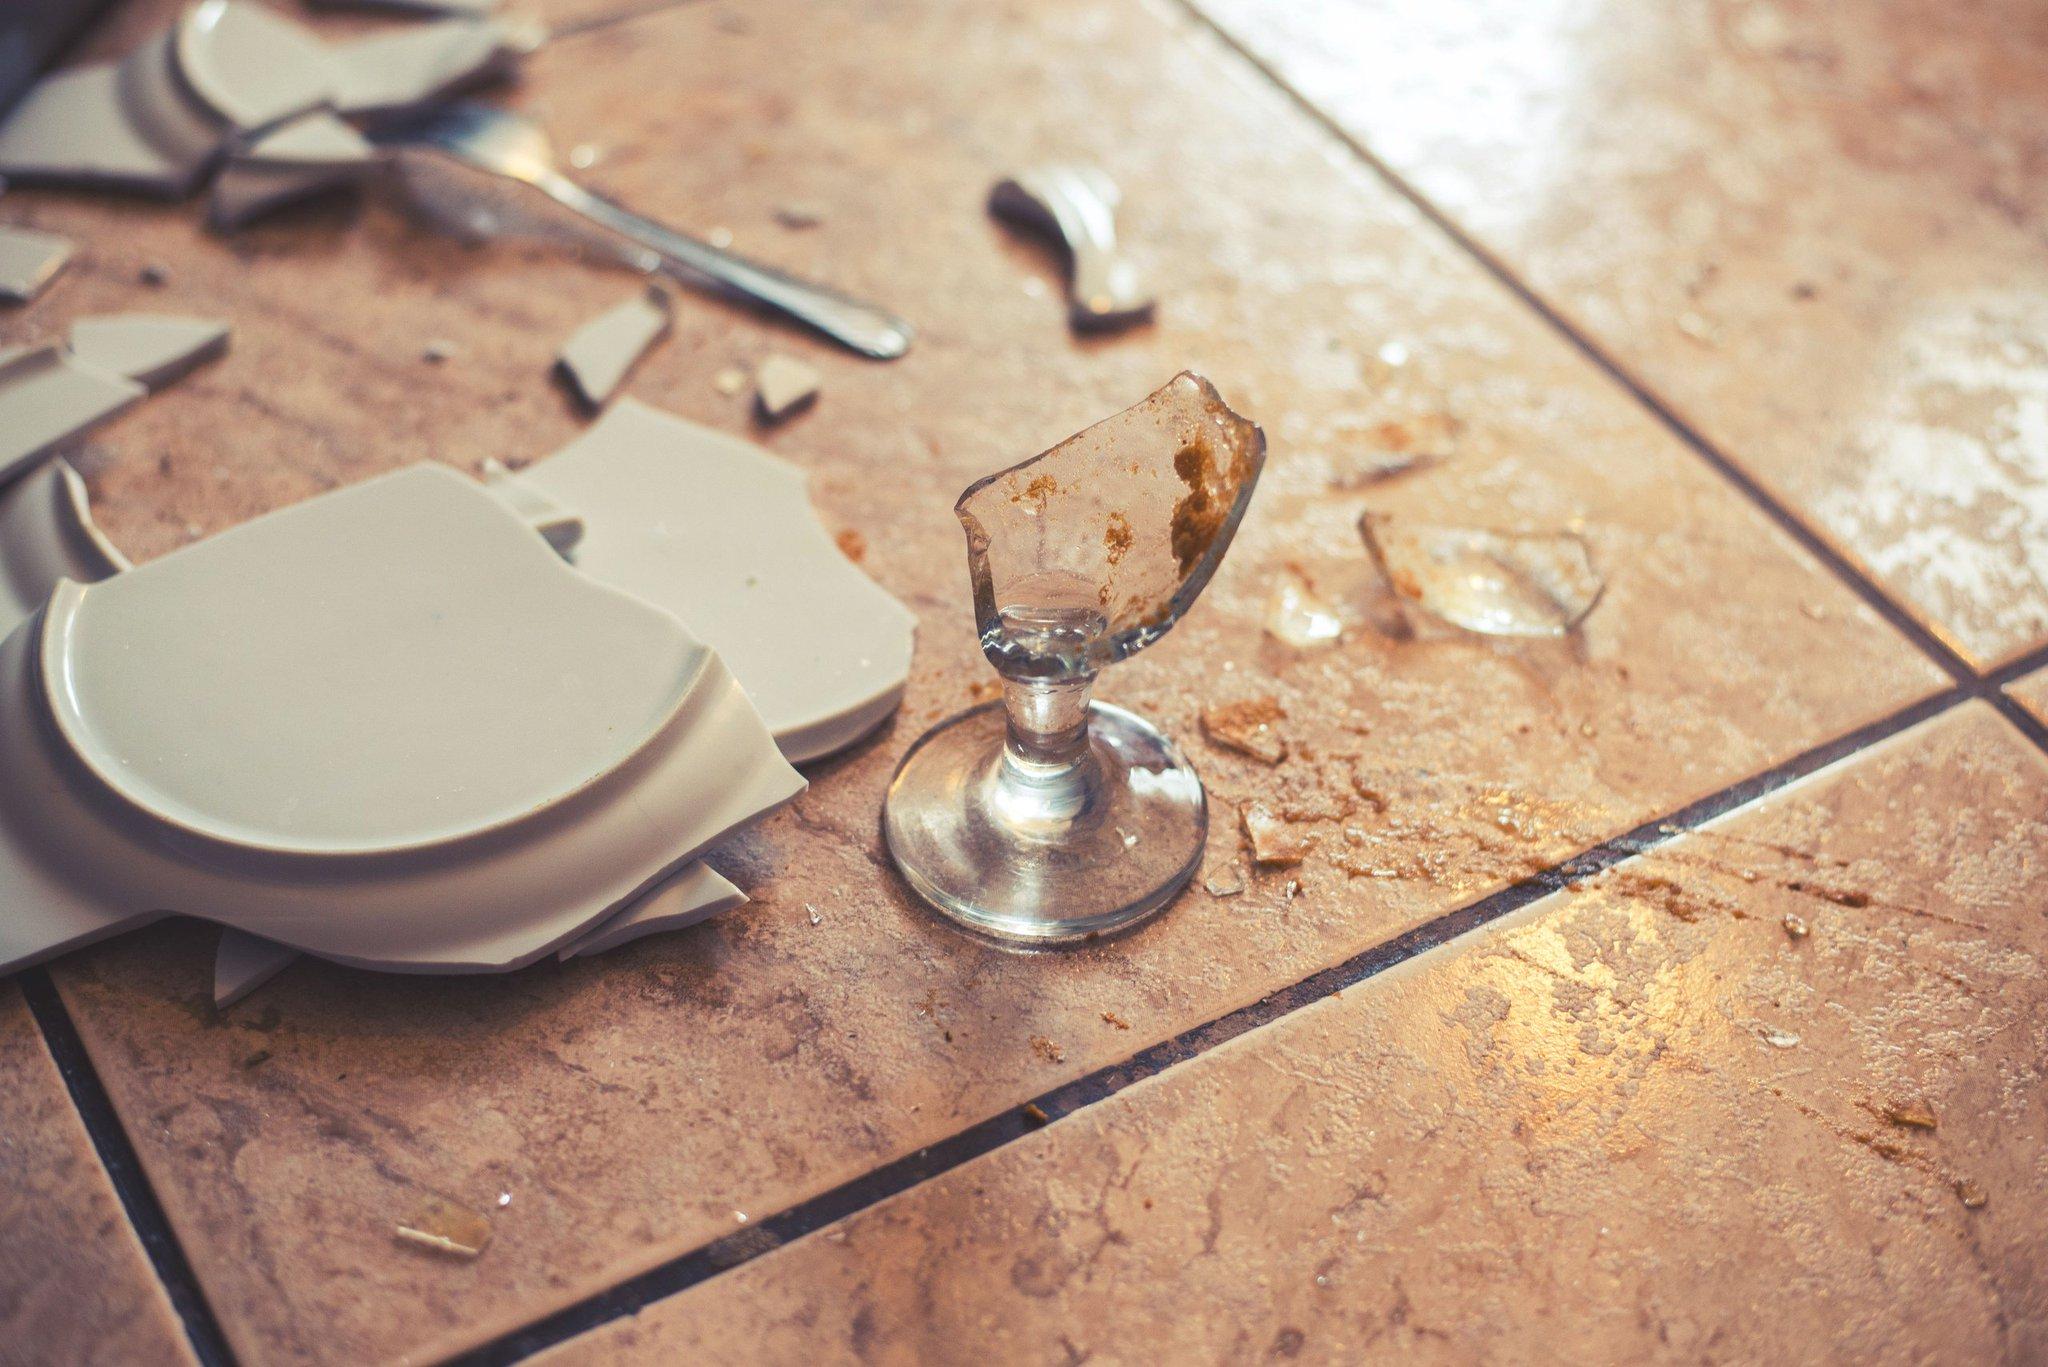 картинки разбитые блюдца